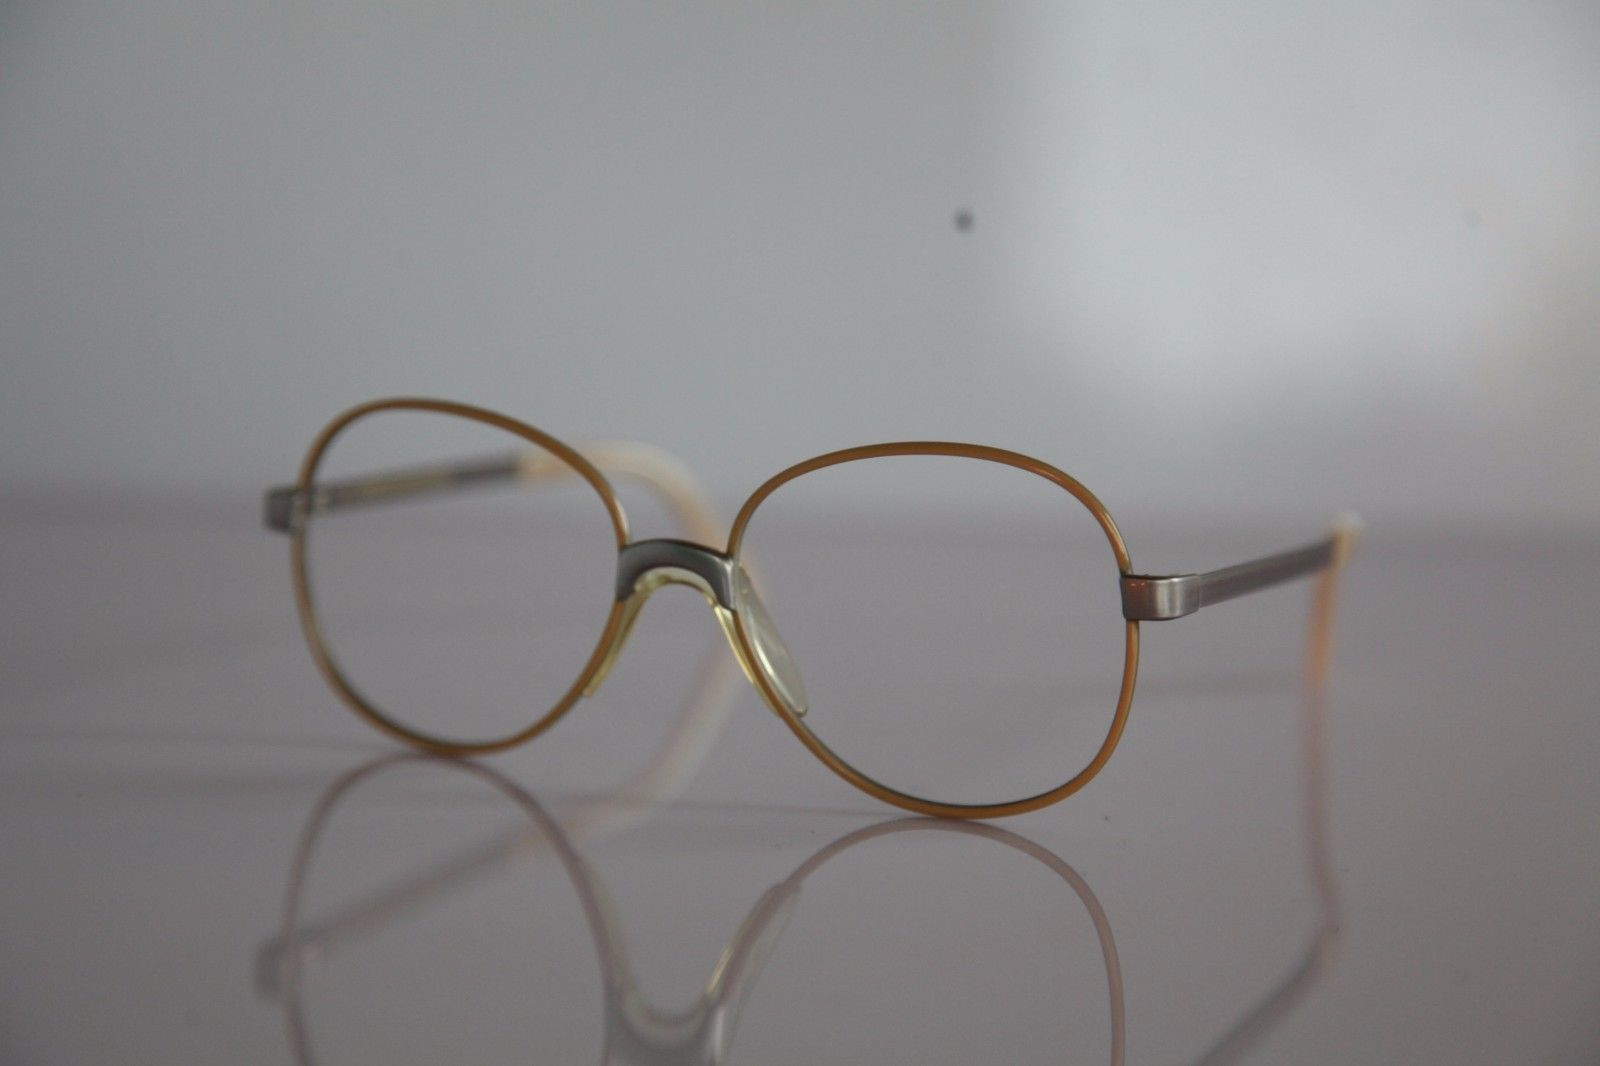 Vintage RODENSTOCK Eyewear, Silver Frame,  RX-Able Prescription lenses. Germany